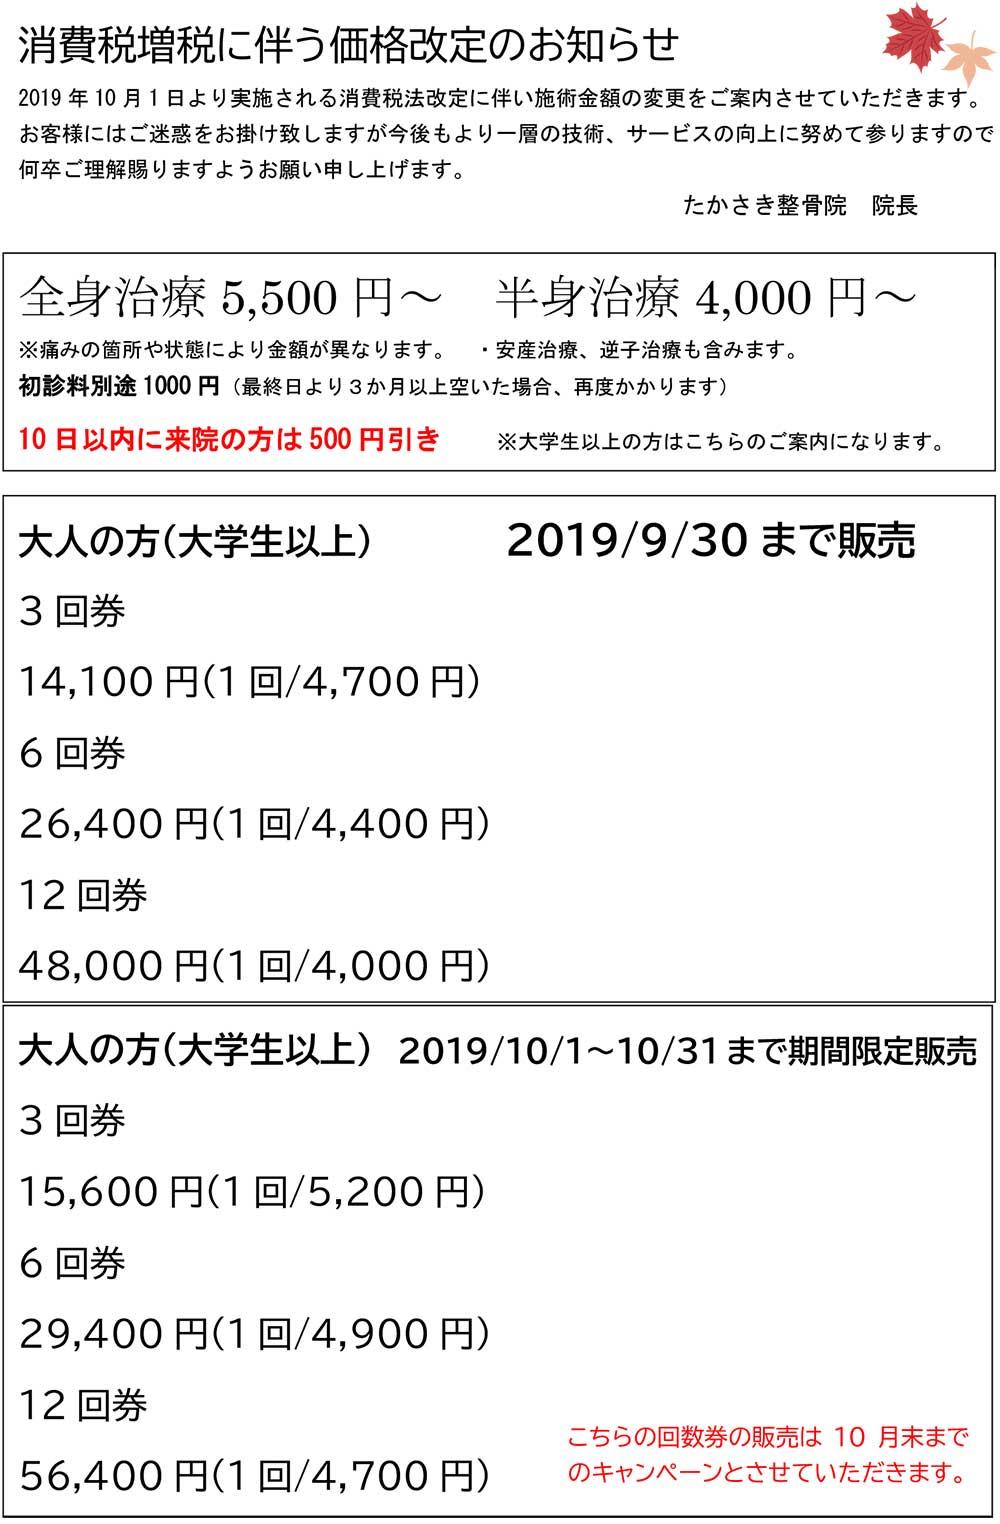 https://takasaki-sk.com/topics/images/1909cam1.jpg